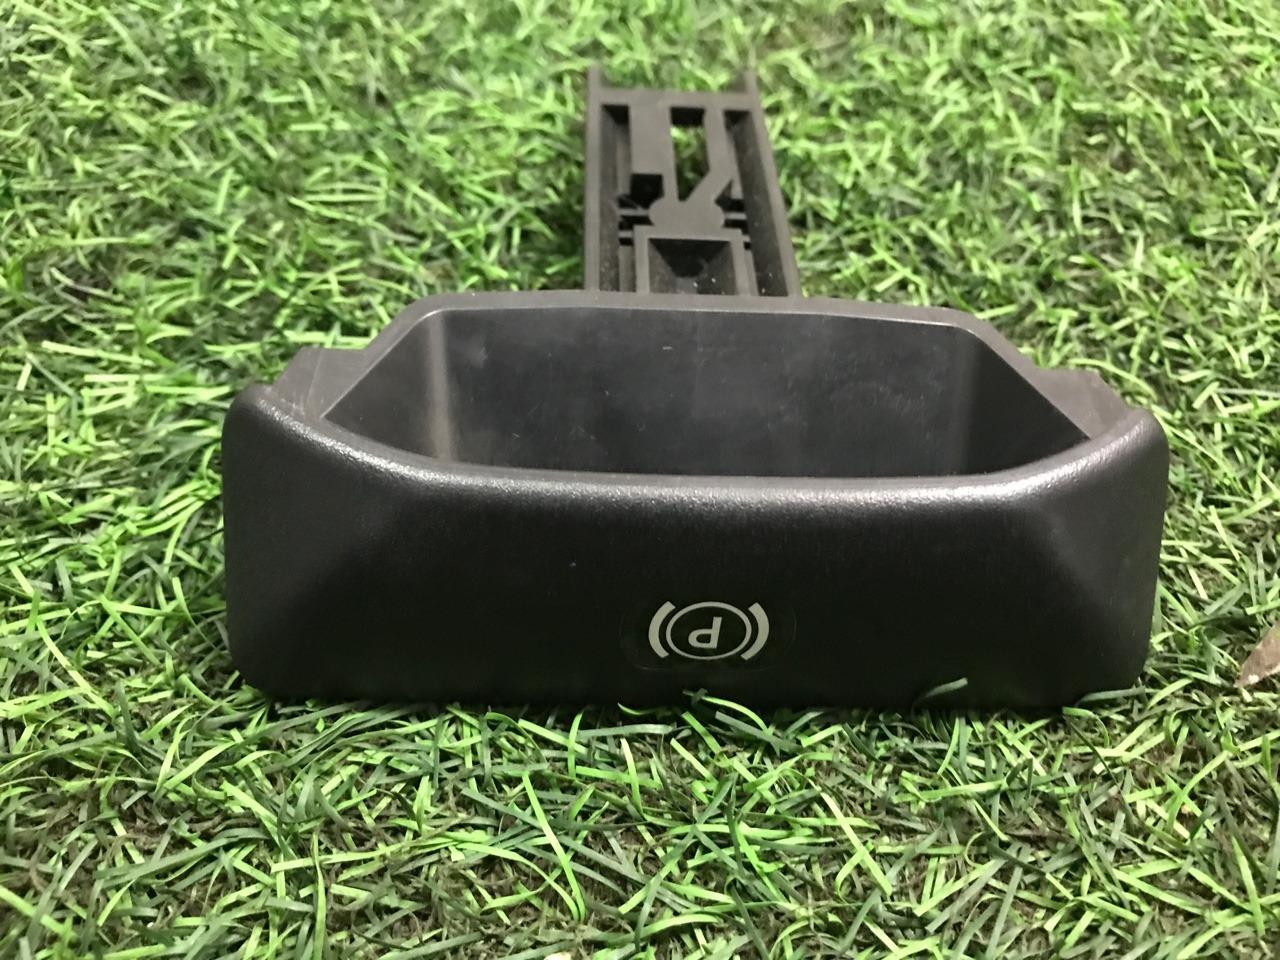 Ручка ручного тормоза C-Class W204